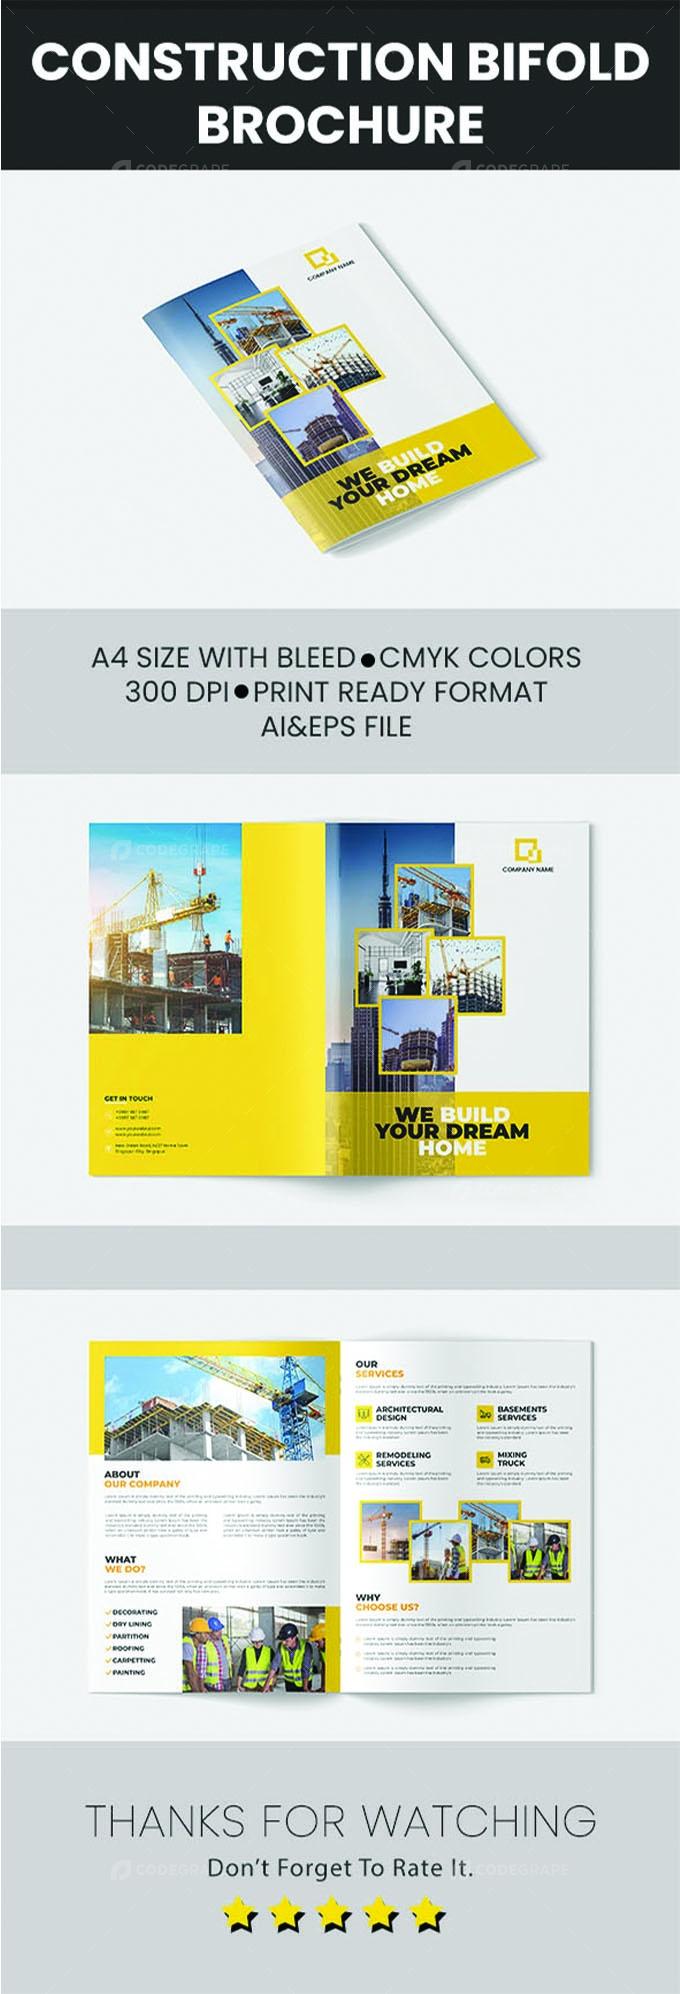 Construction Bifold Brochure